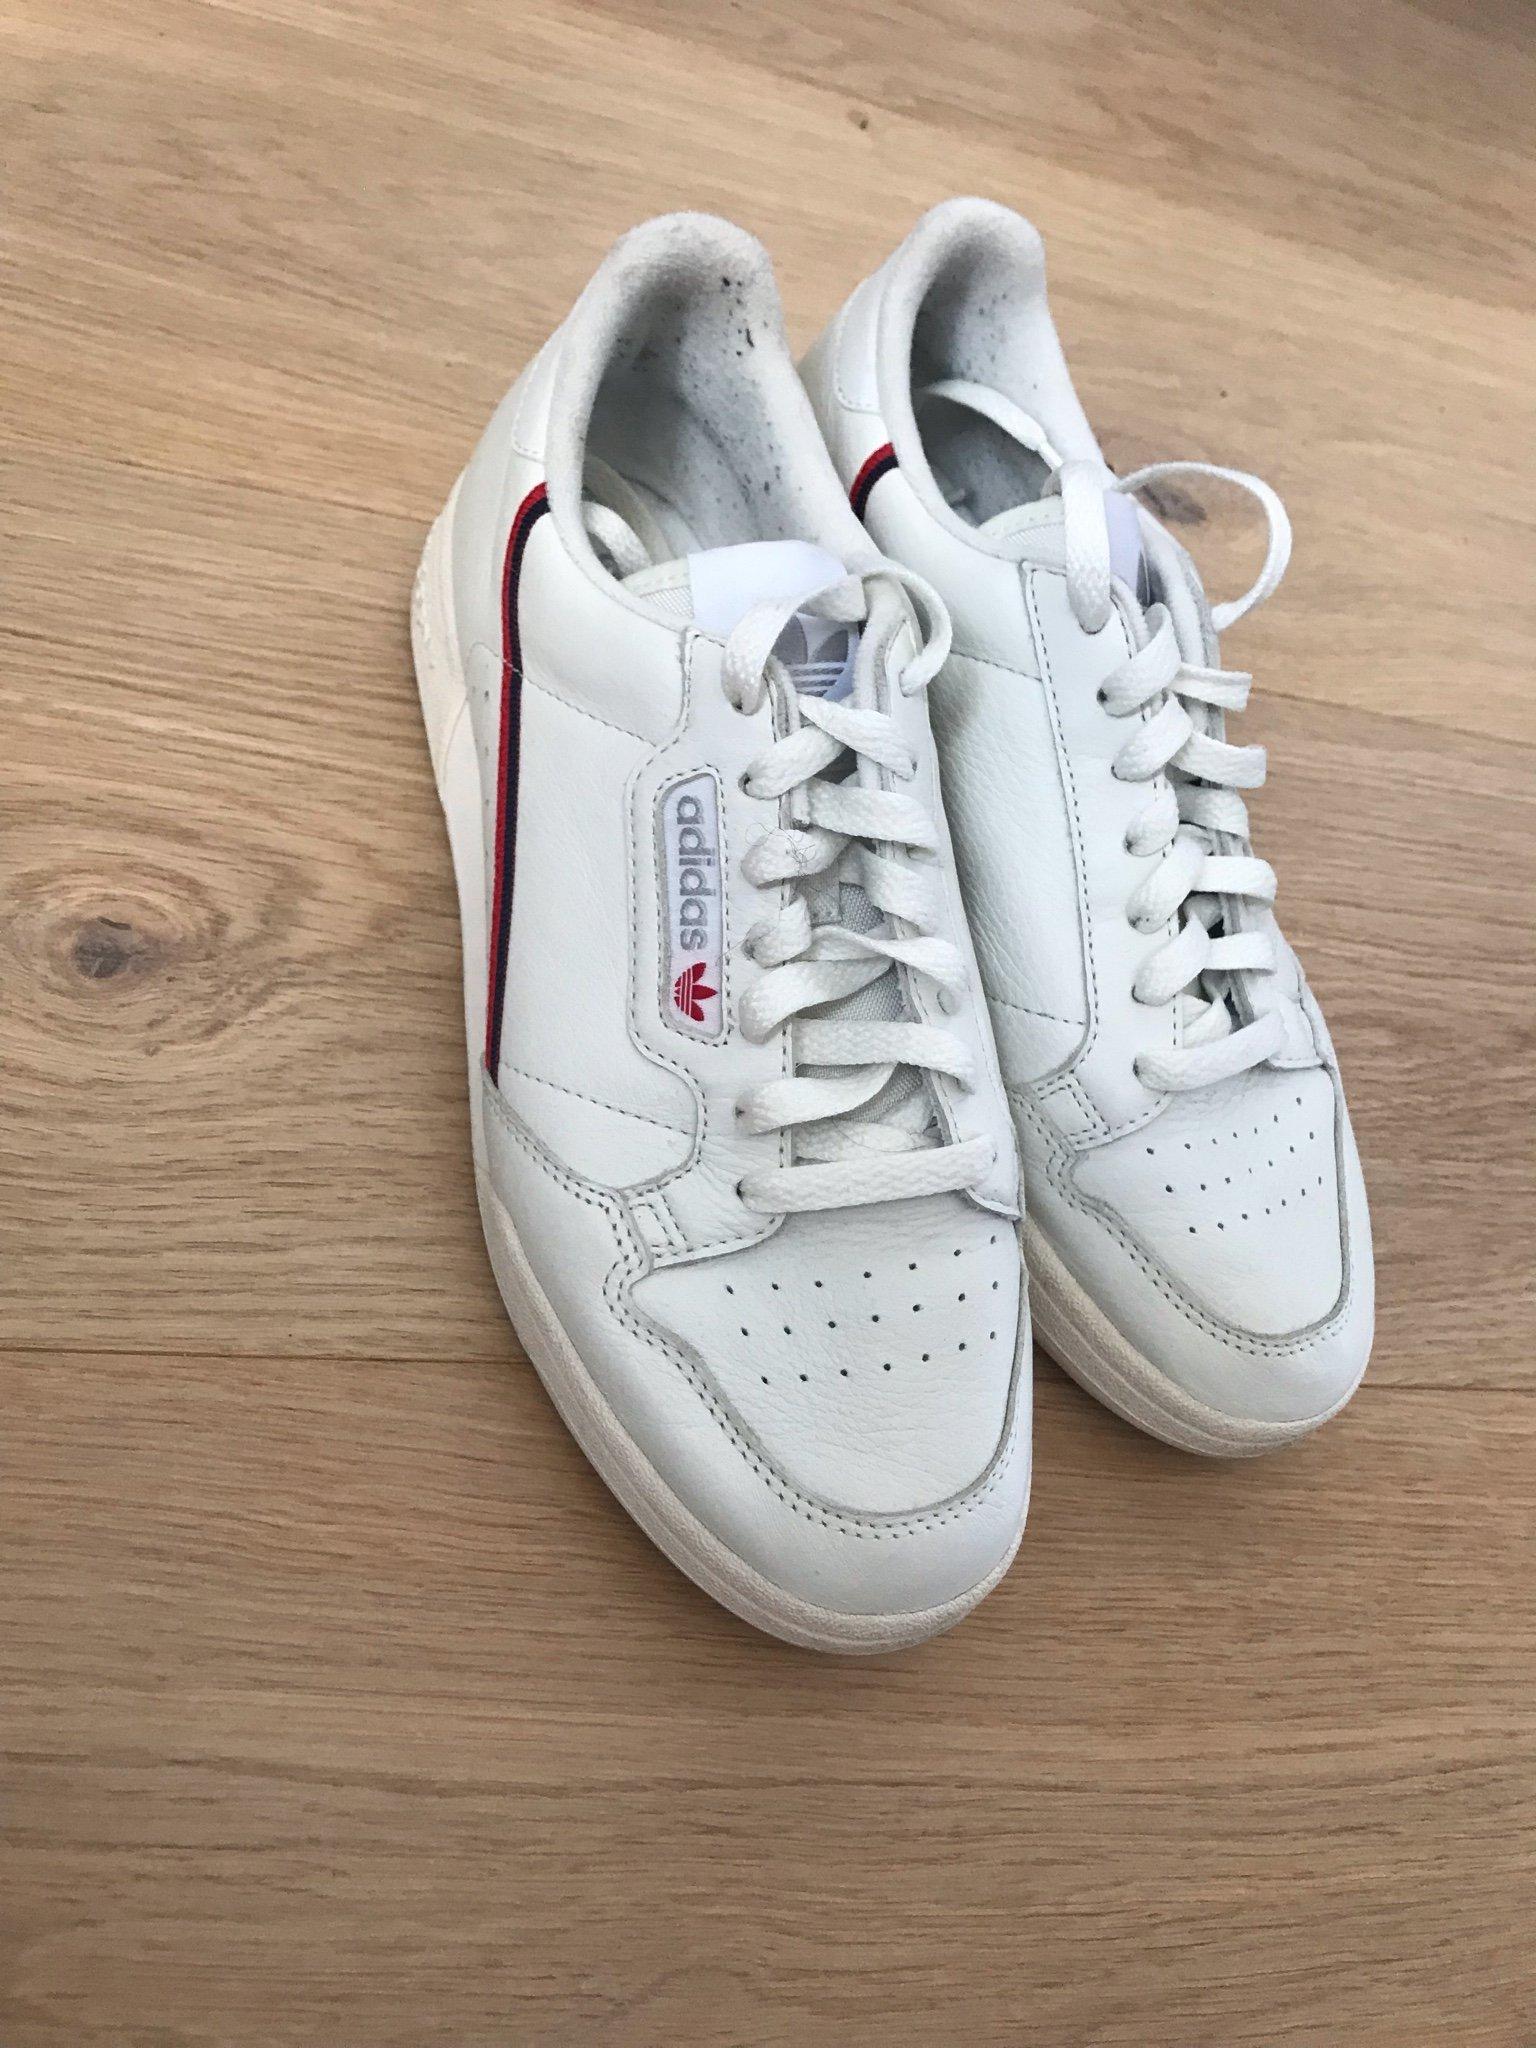 save off d8c1d 9d7a8 adidas Originals Continental 80, 38.5 - beige vita sneakers sneakers Dam